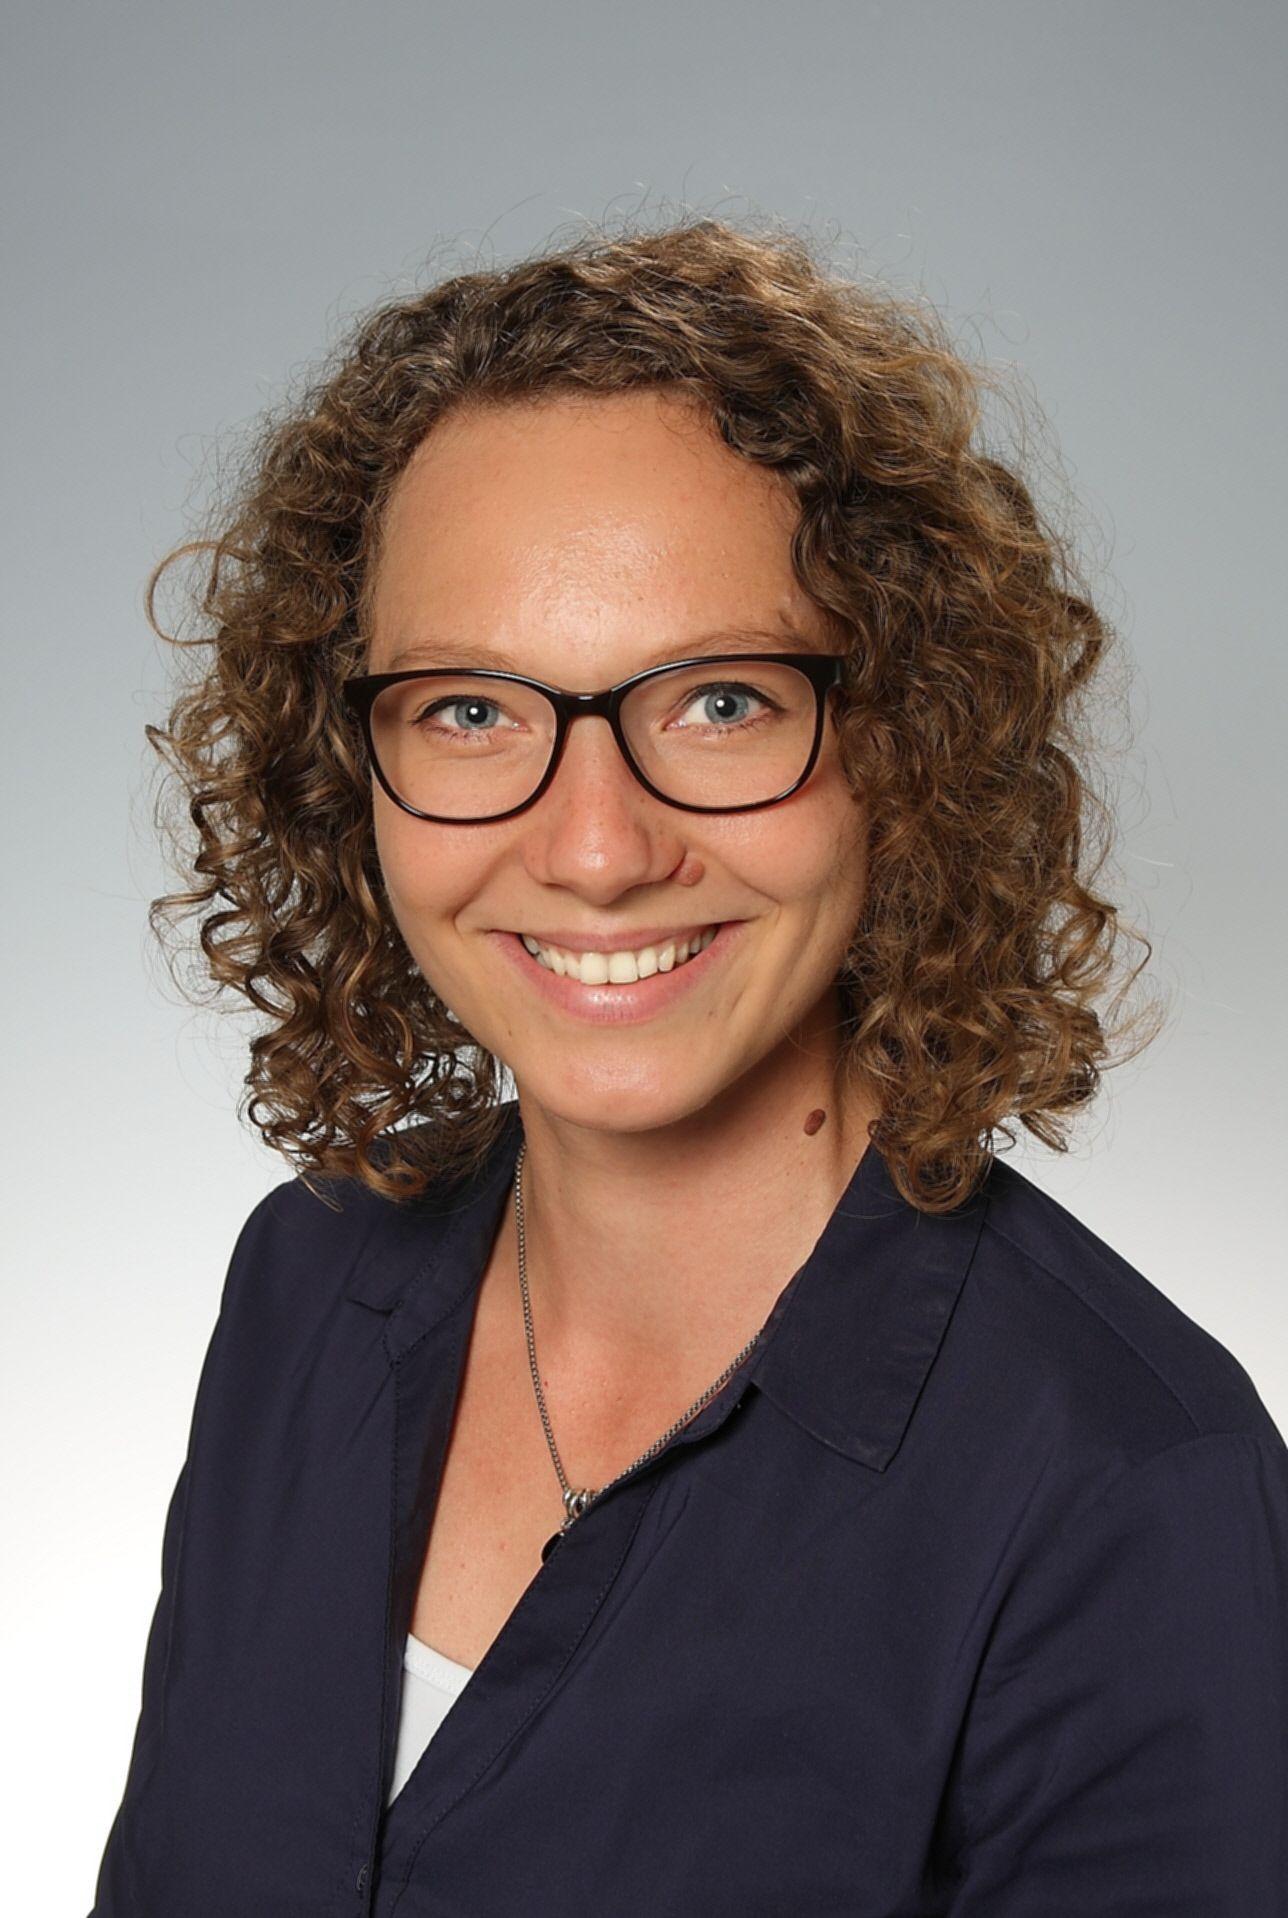 Sandra Sturmbauer